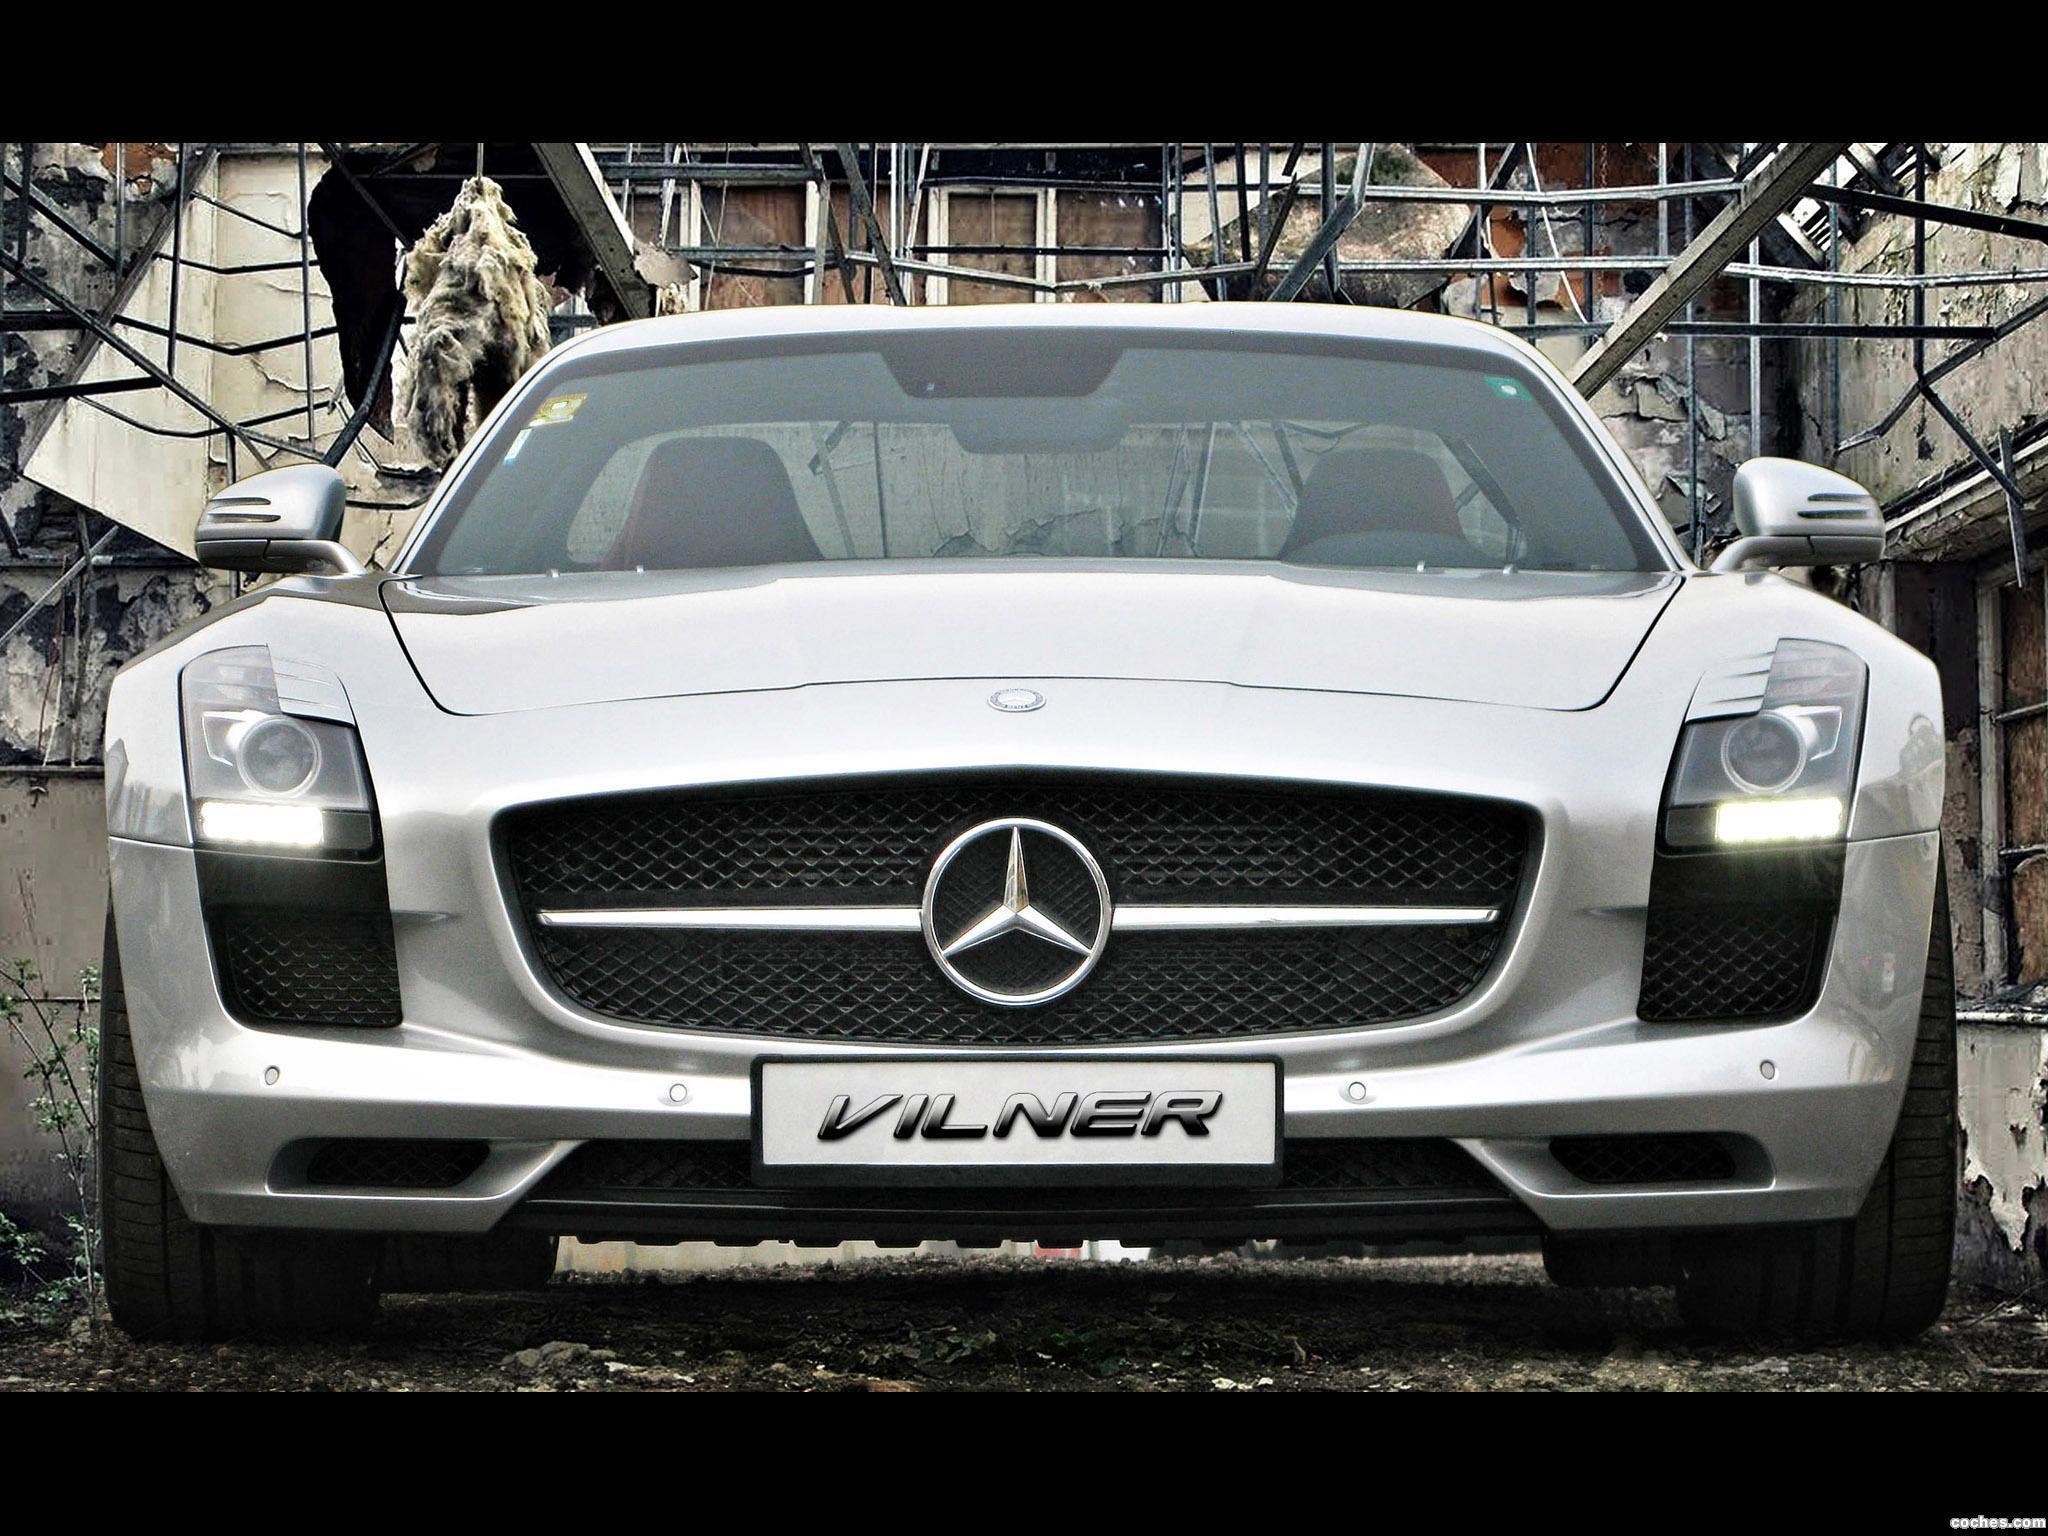 Foto 2 de Mercedes Vilner SLS AMG 2013